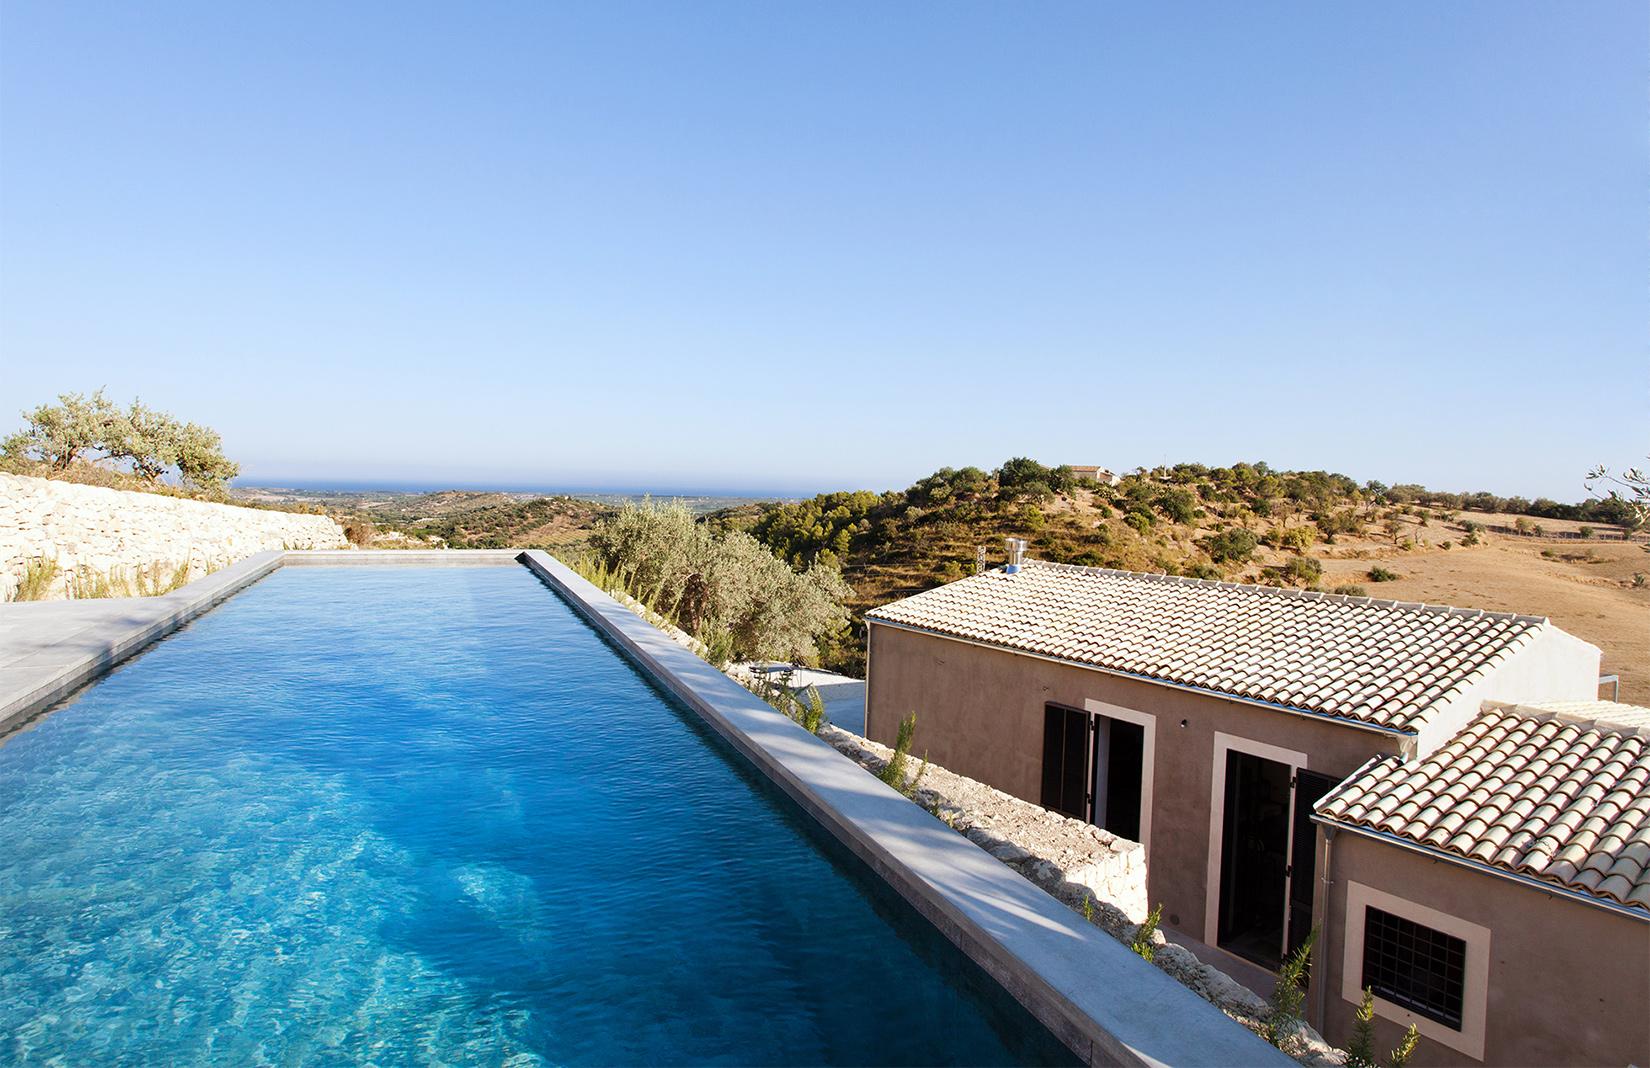 Villa Mura Mura, a hillside retreat in noto with a spectacular swimming pool